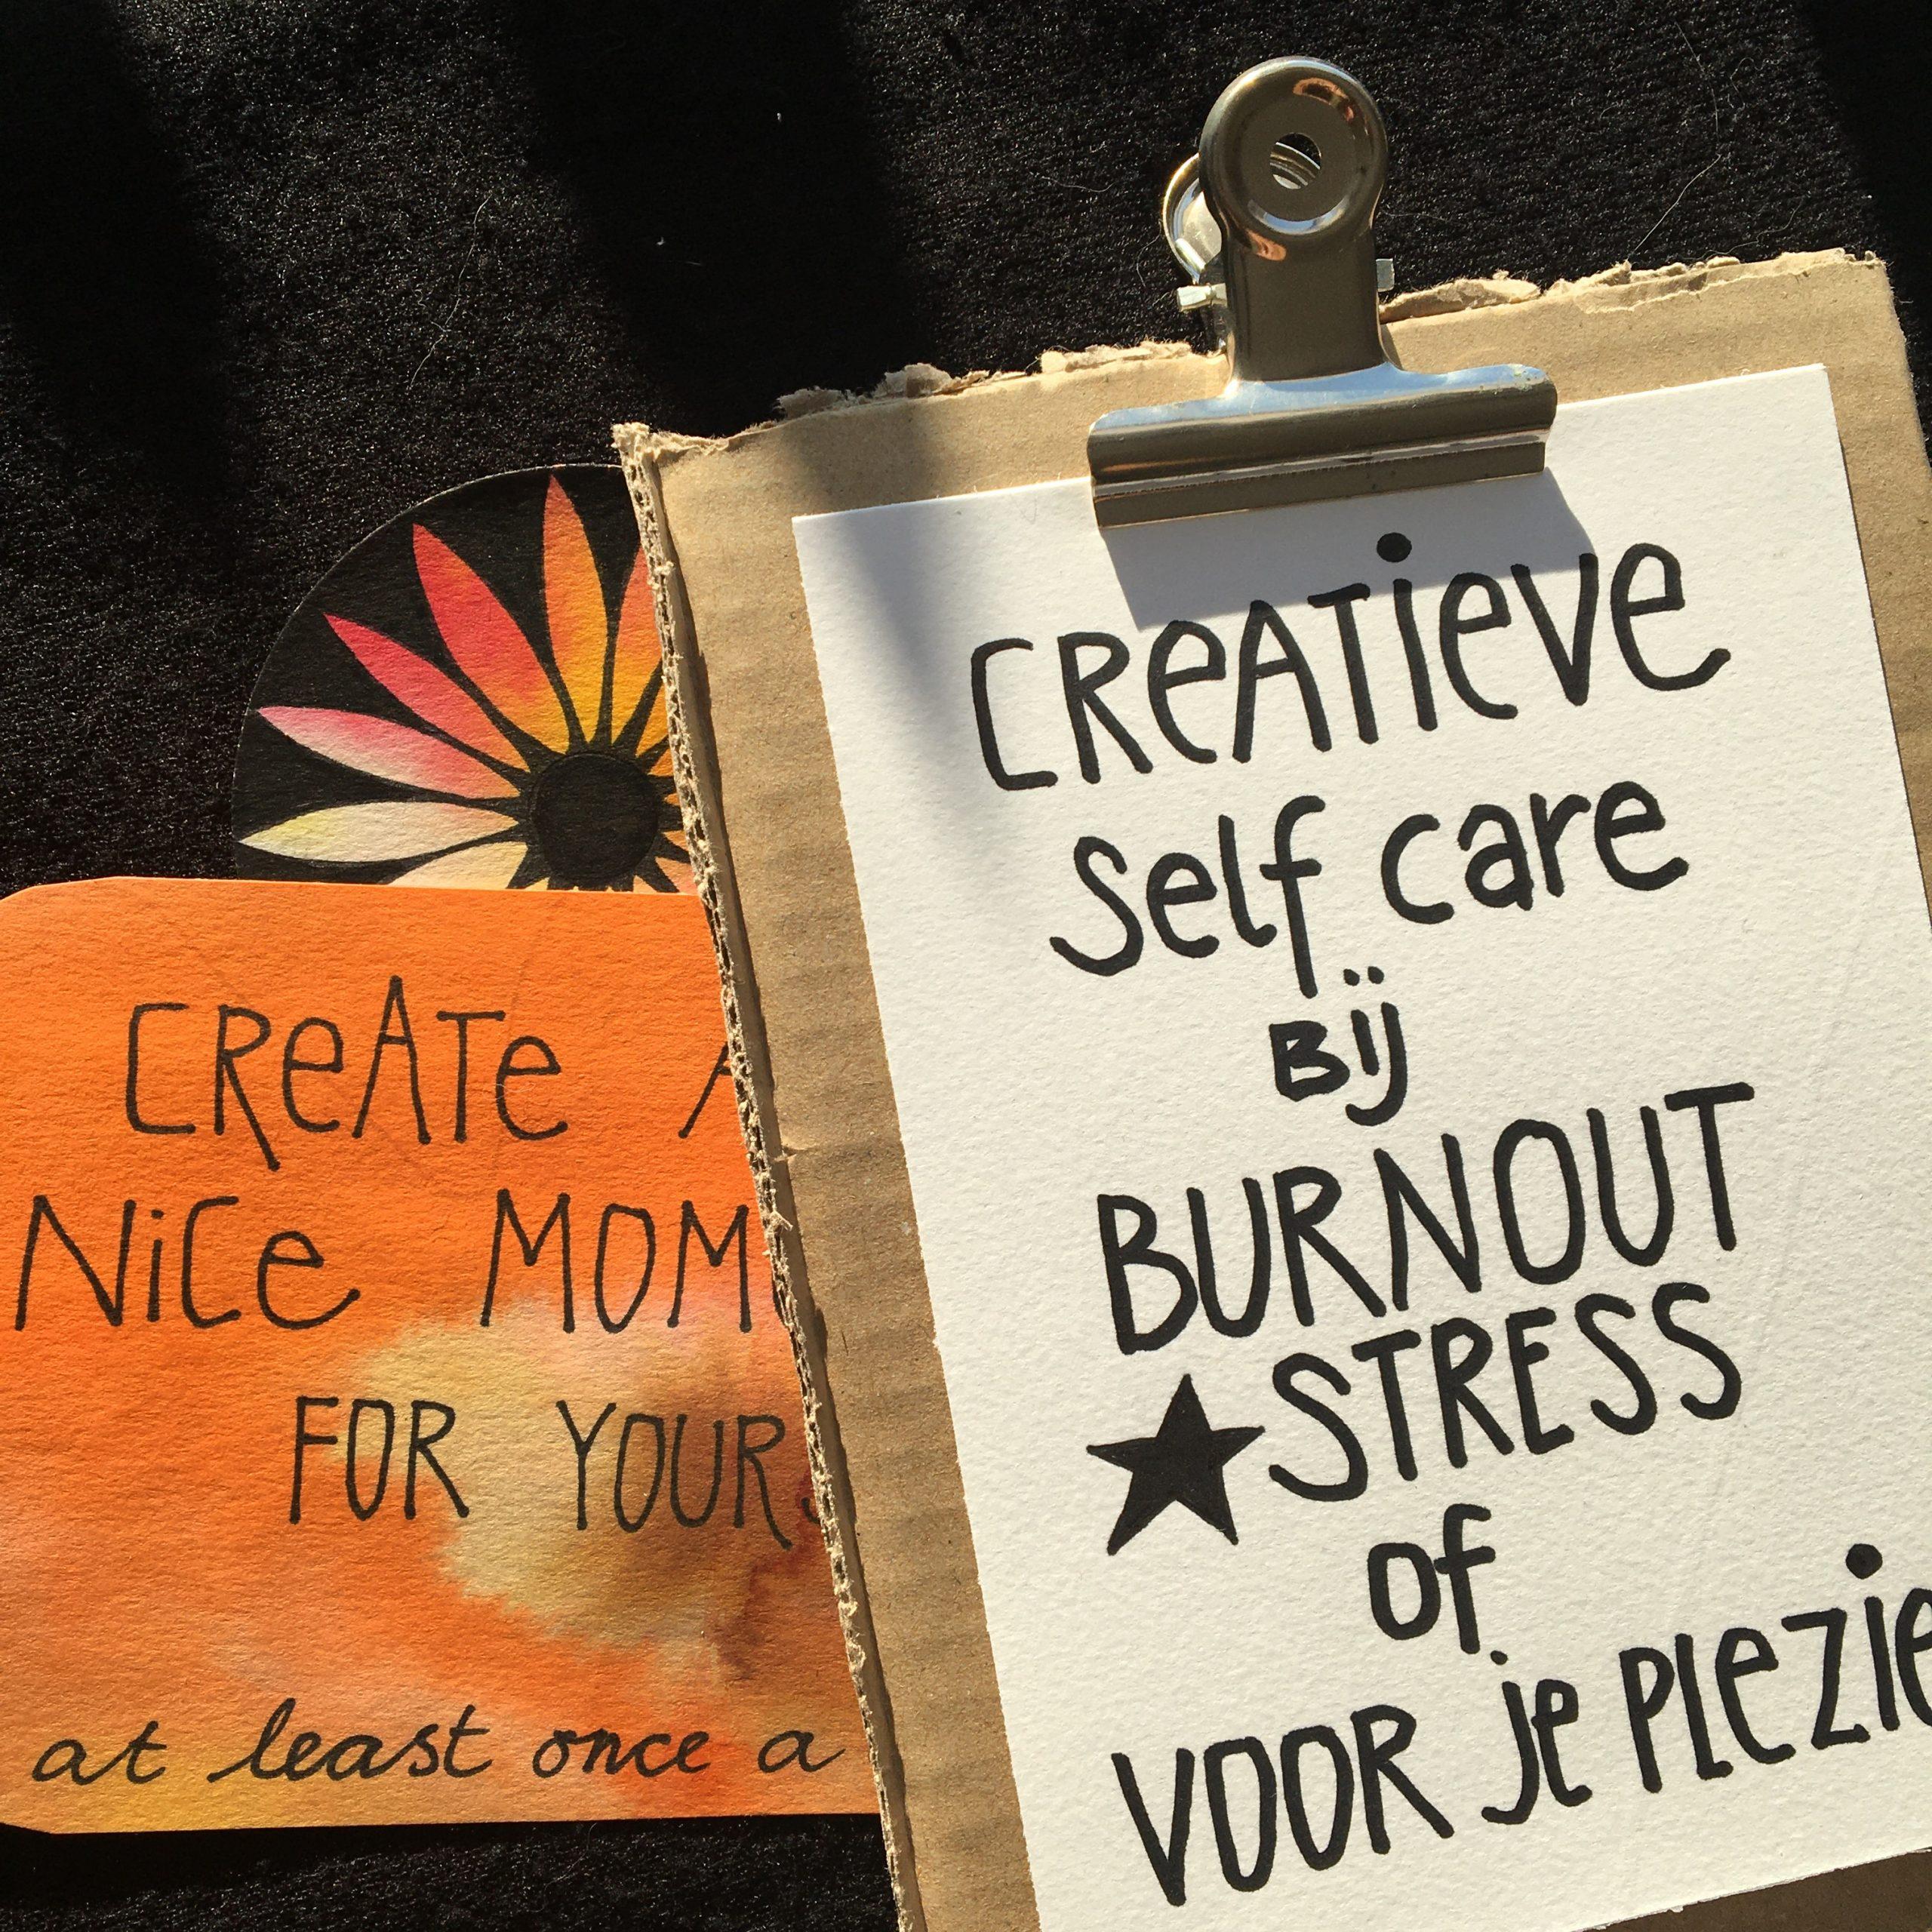 4-DAAGSE * Online cursus Creatieve APK;  Zelf-Care bij Stress & Burn-out